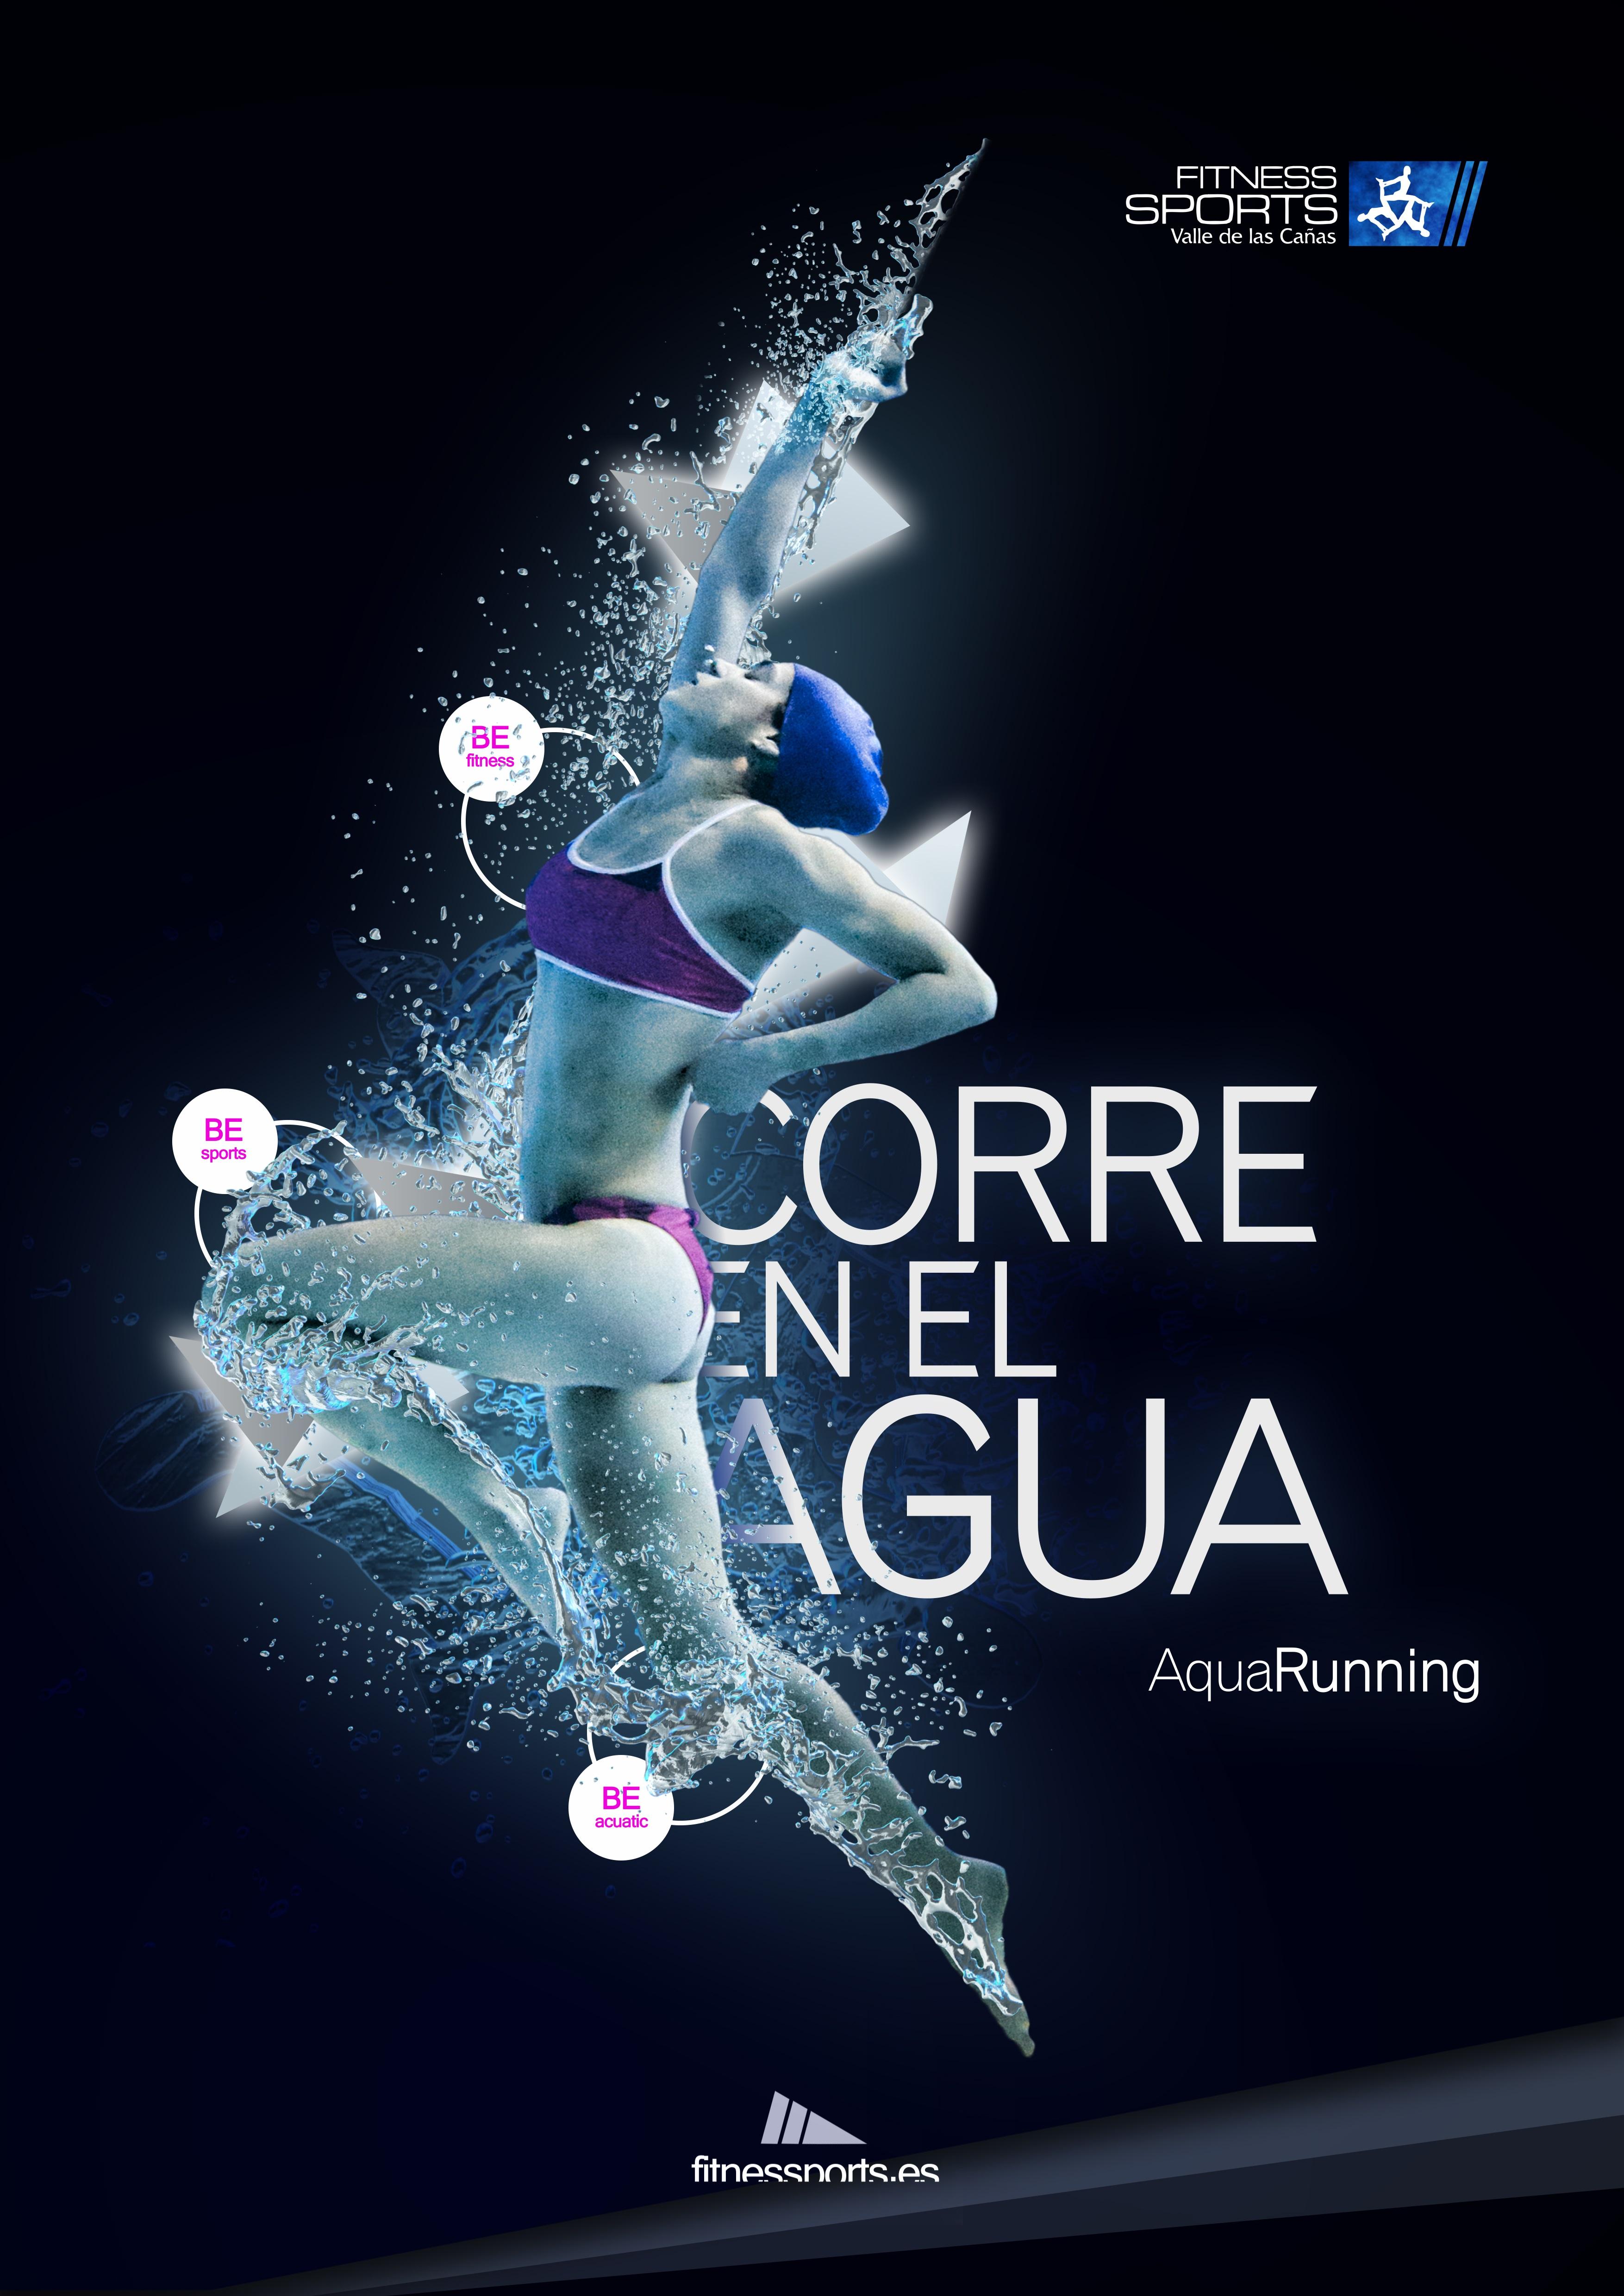 https://www.perfectpixel.es/wp-content/uploads/2014/03/Aqua-Running-Fitness-v2-poster-Fitness-Sports-fitnessports-by-PerfectPixel-Publicidad.jpg